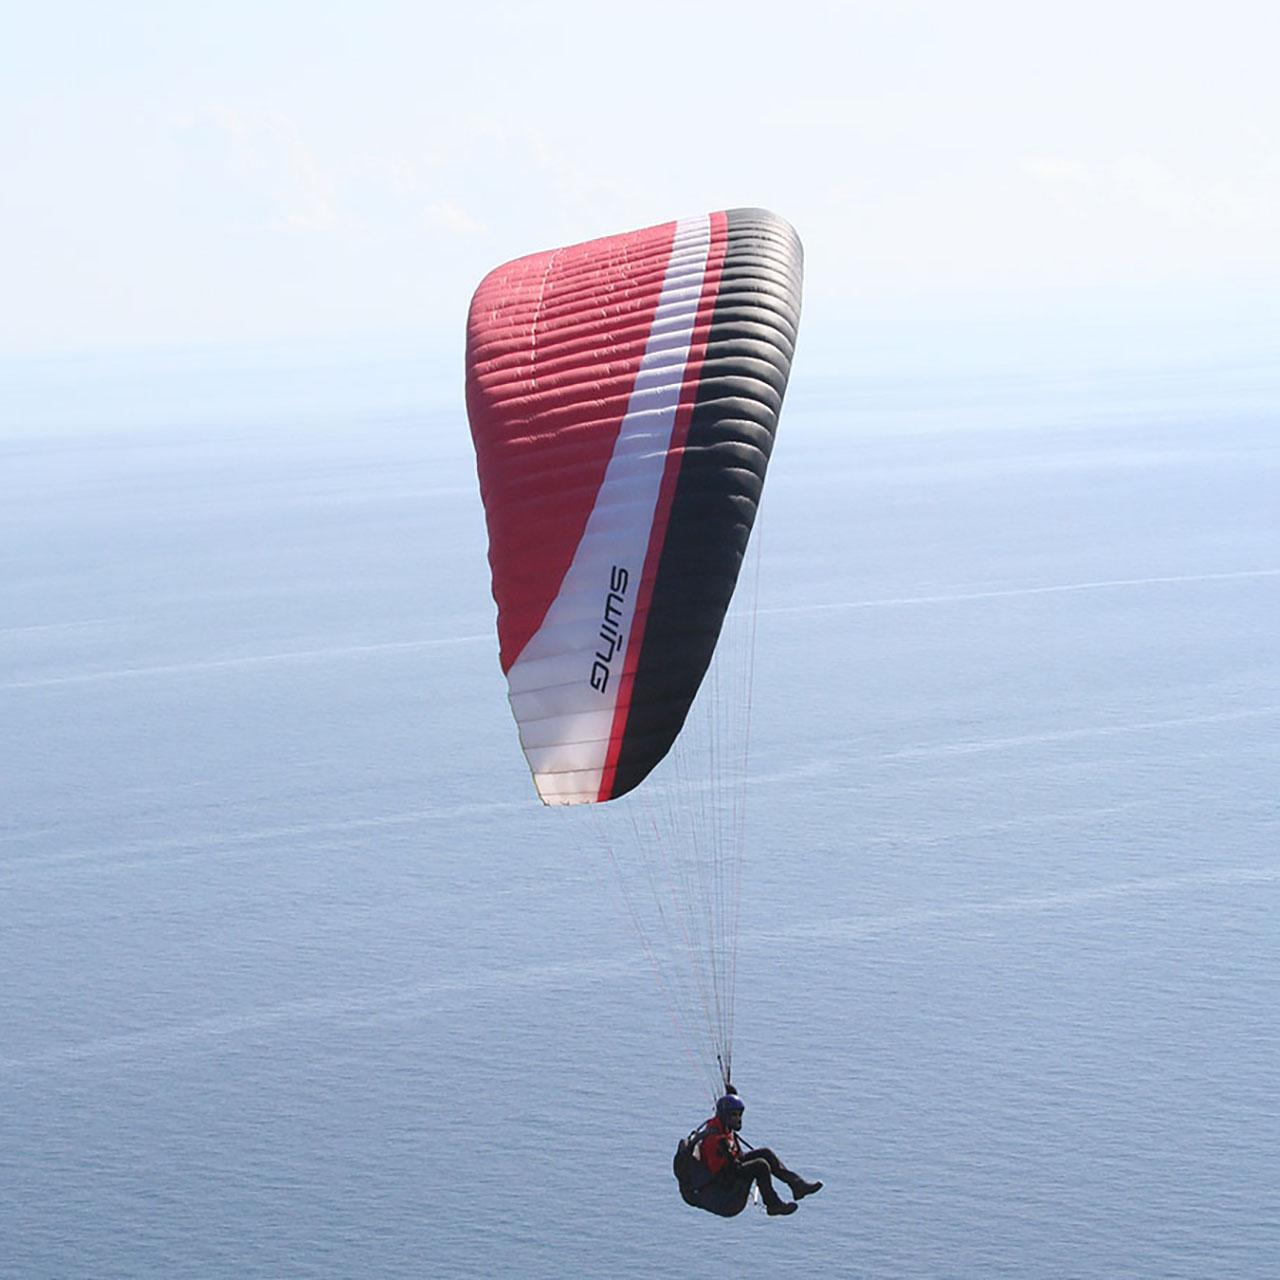 aeroclub-albatros-parapendio-1280-6